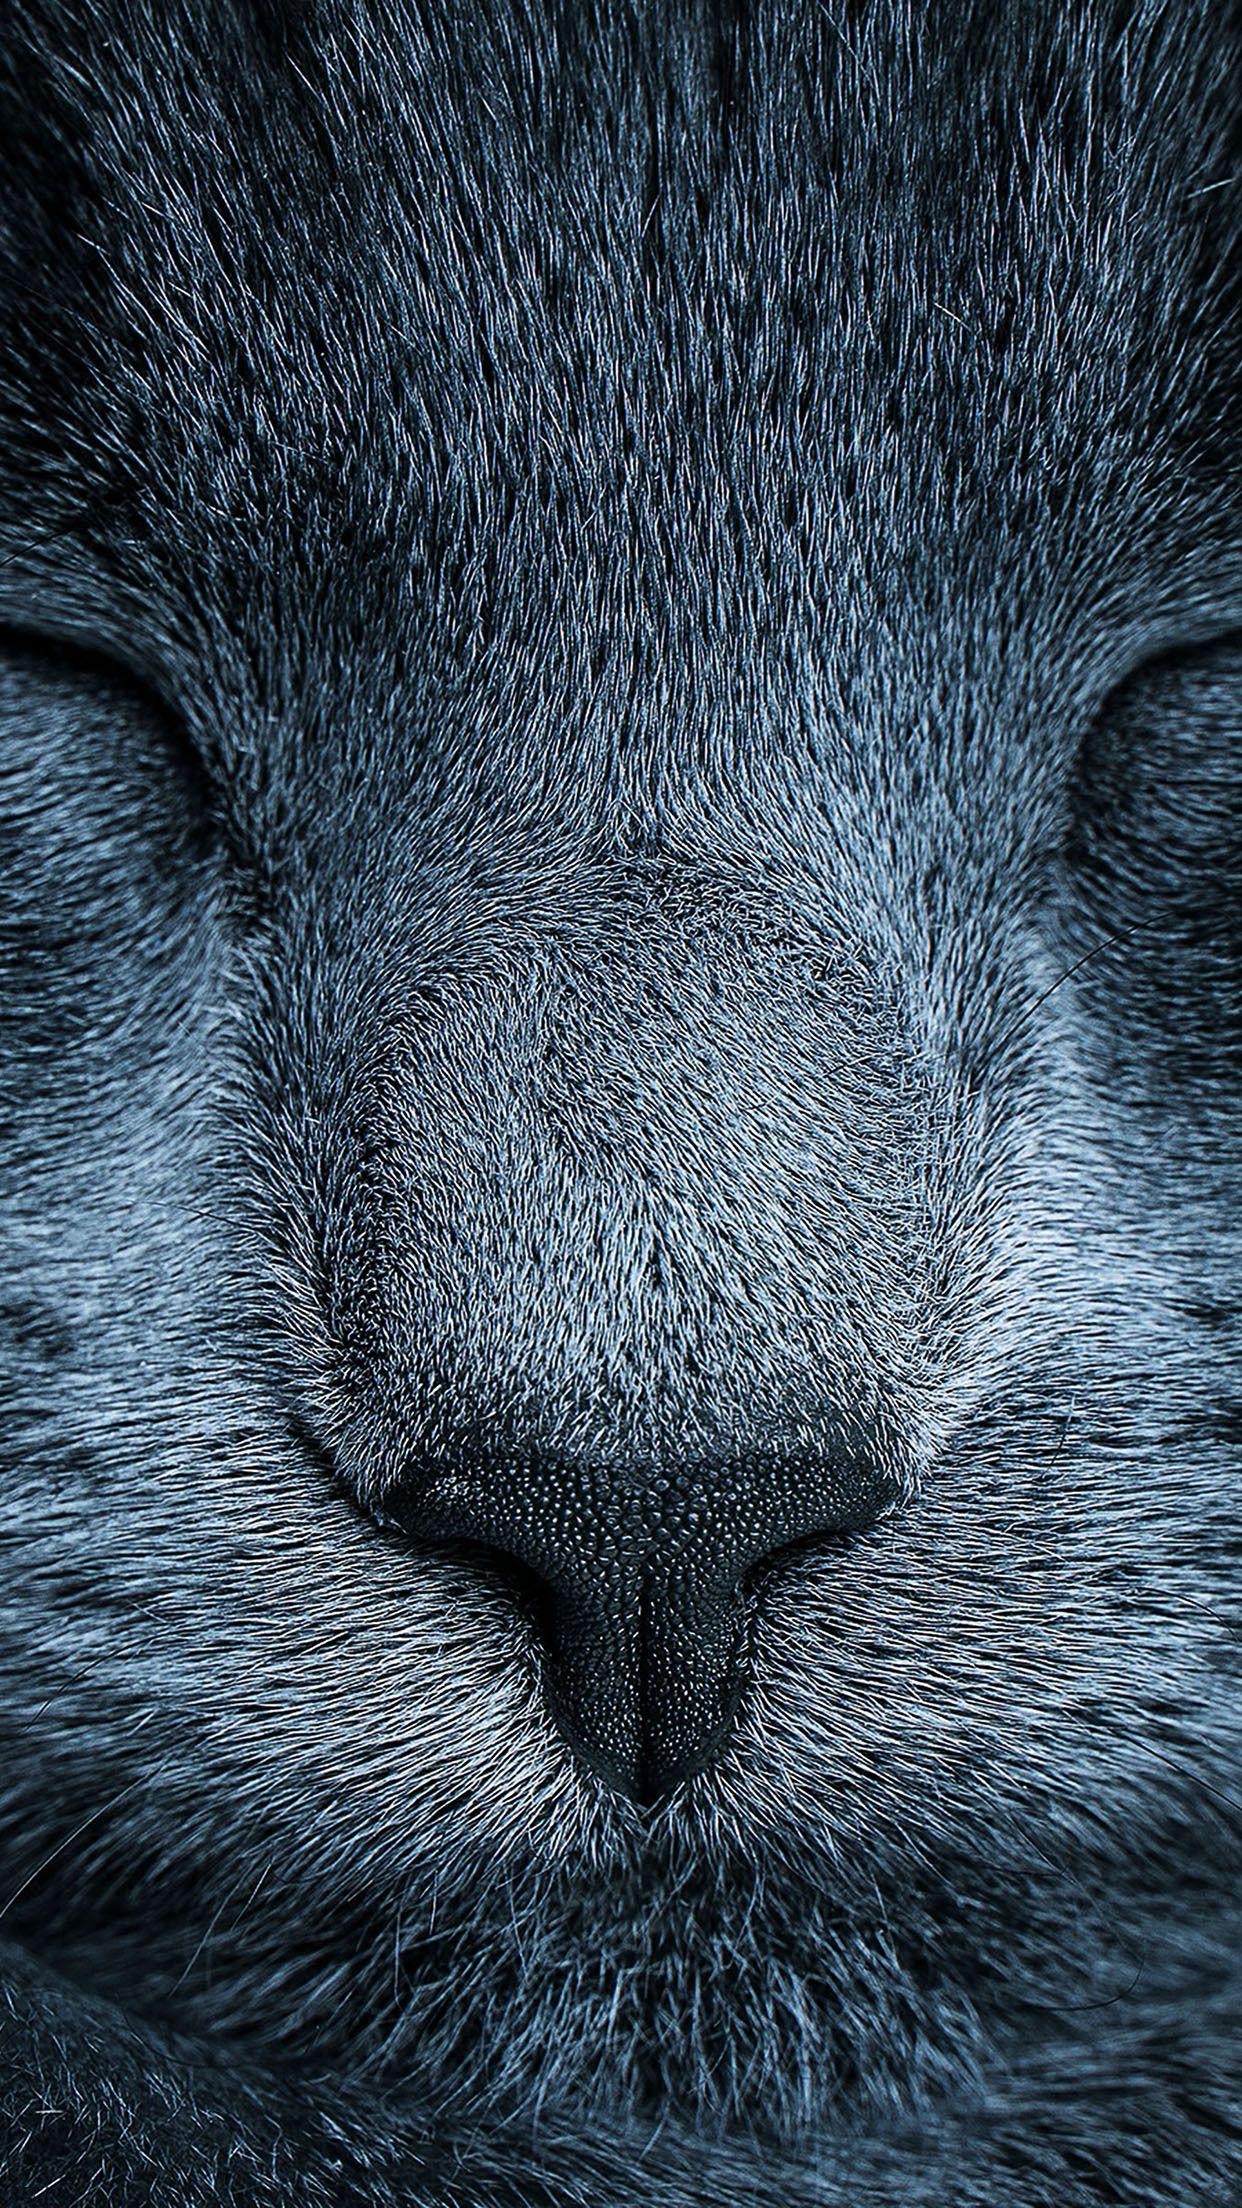 Kitty Nose Photo Animaux Animales Animaux